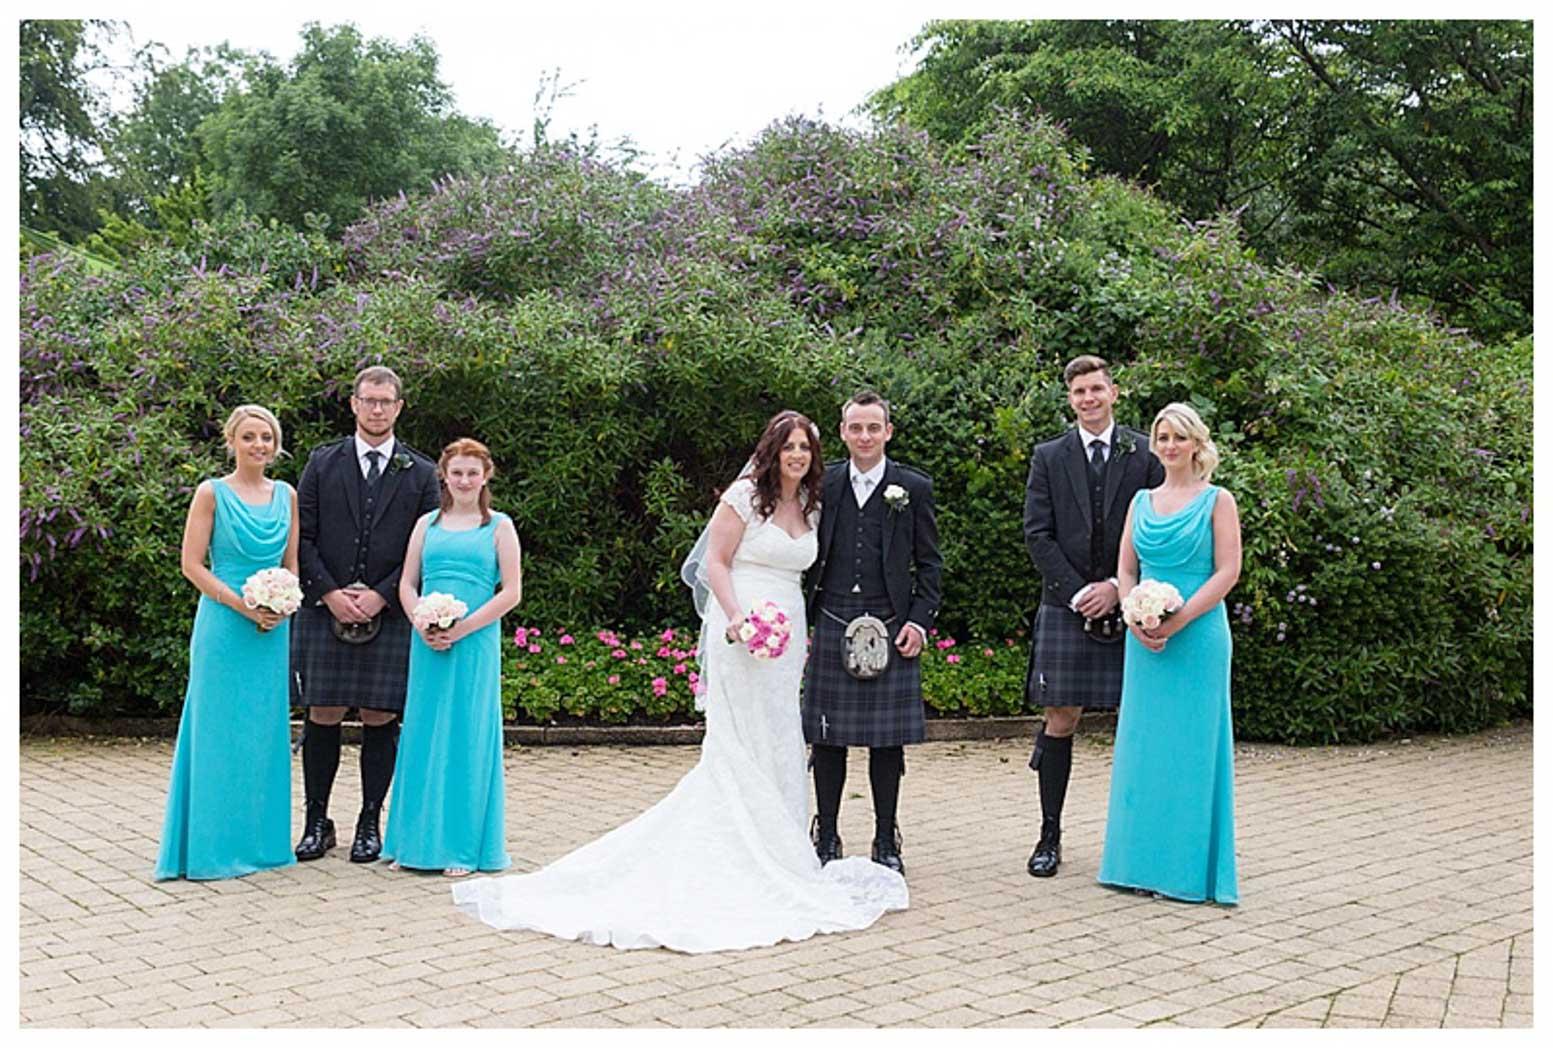 Ballygally Castle Wedding Photographs by Ricky Parker Photography-32